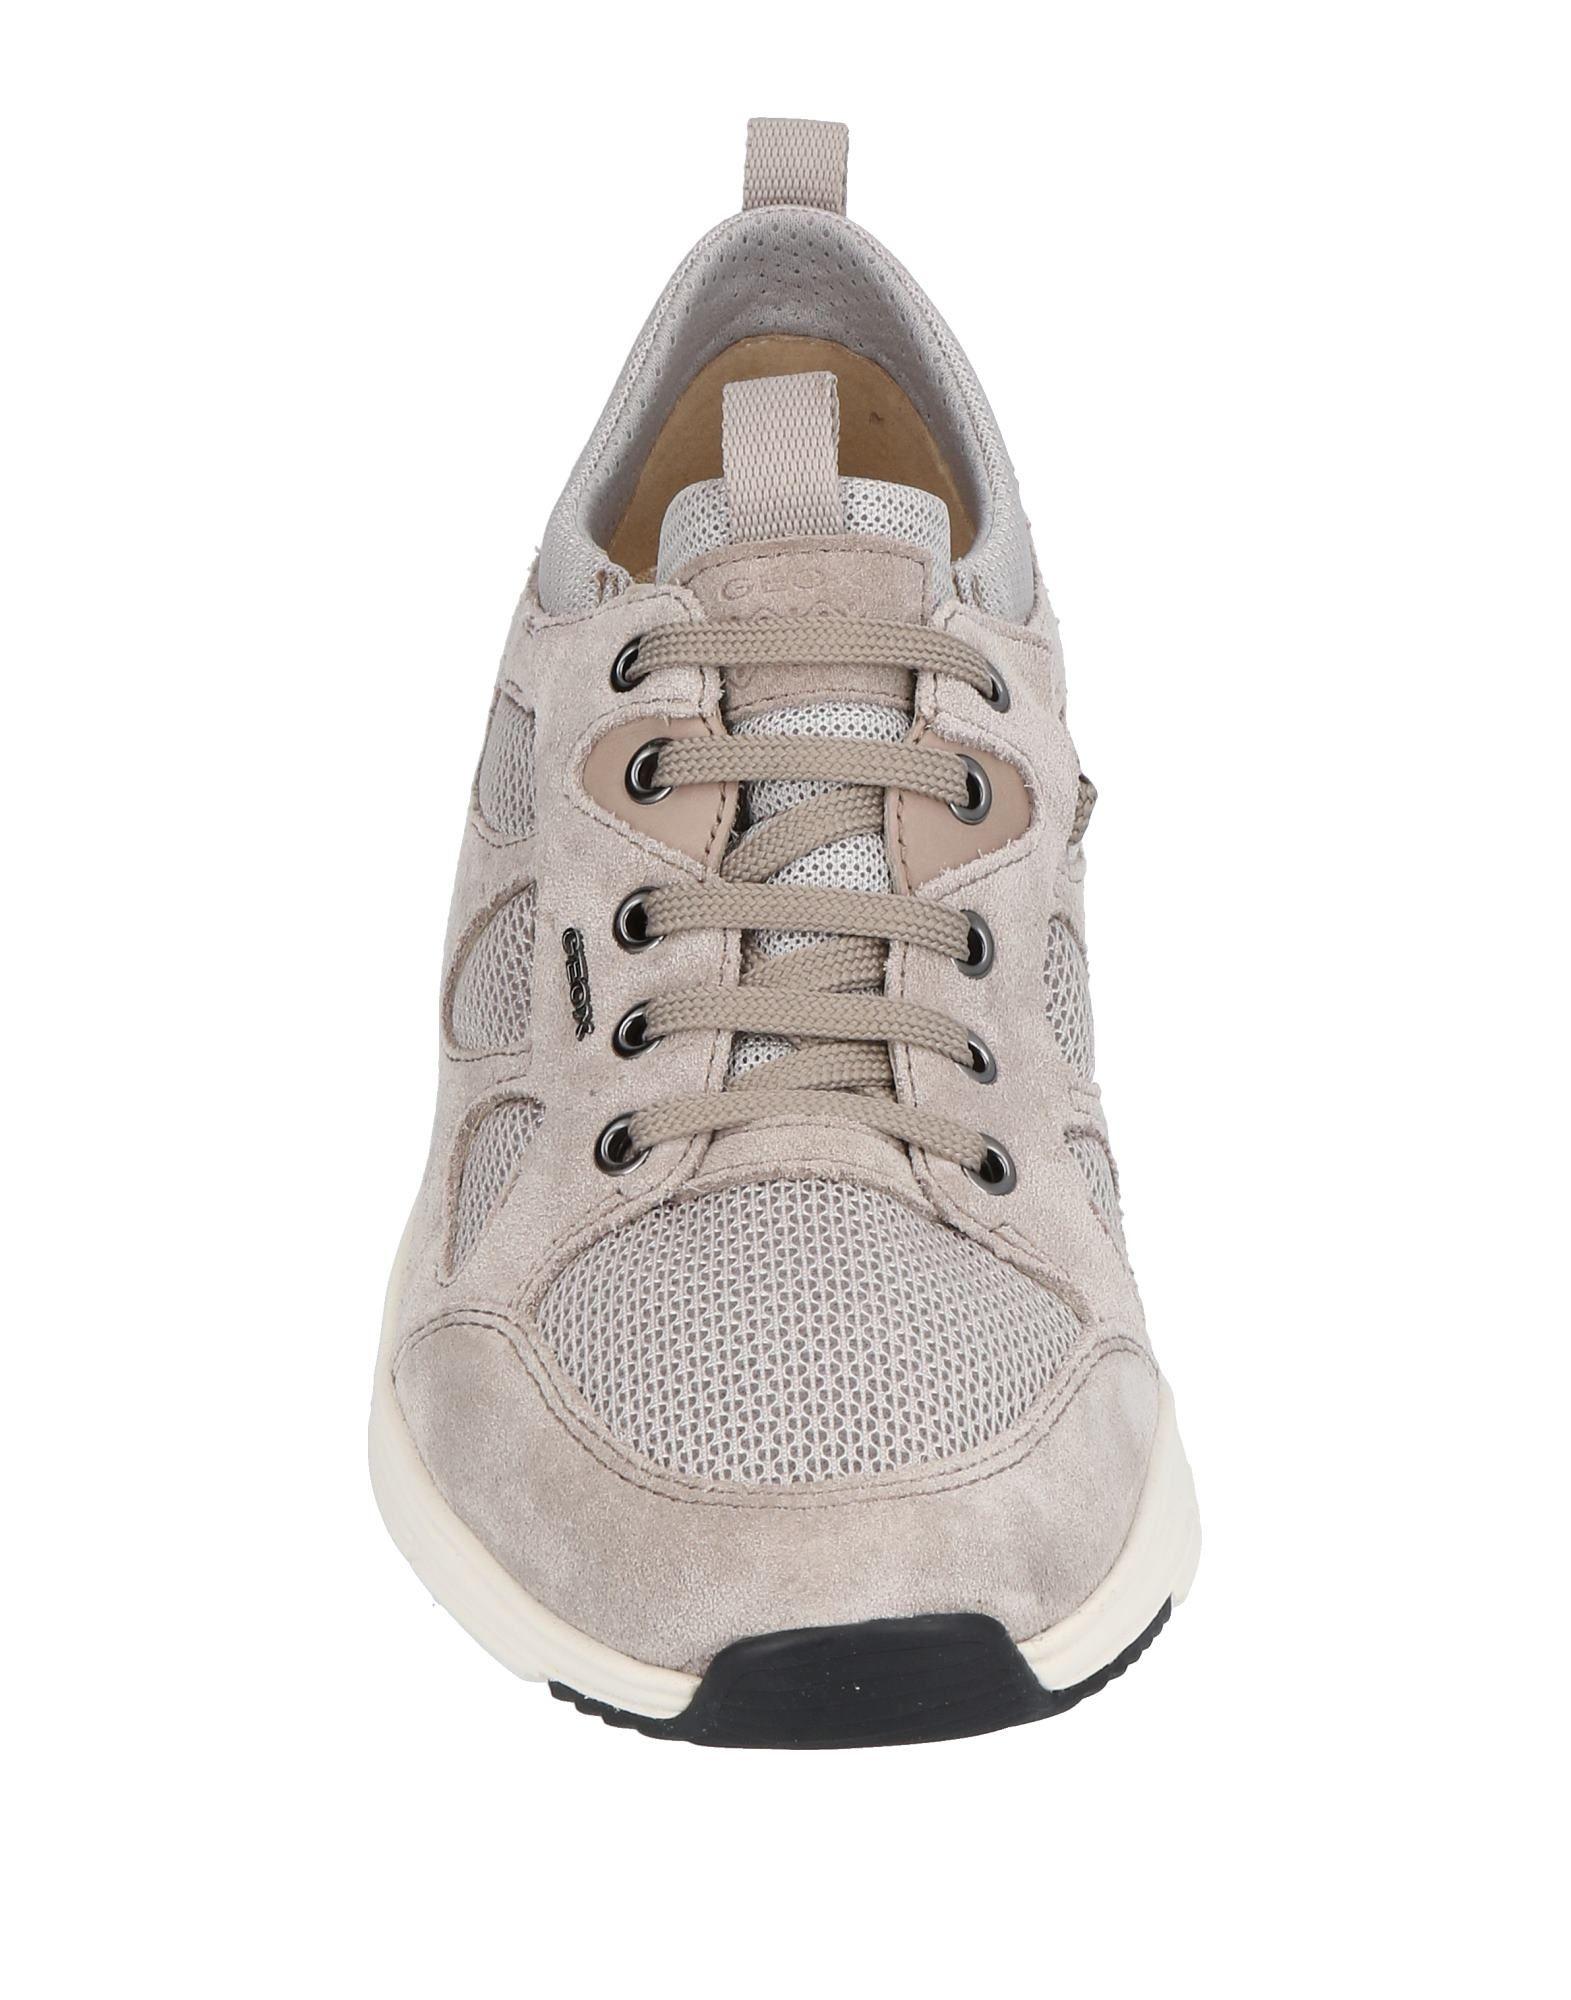 Geox Sneakers Herren   11464238QM Heiße Schuhe 211bba